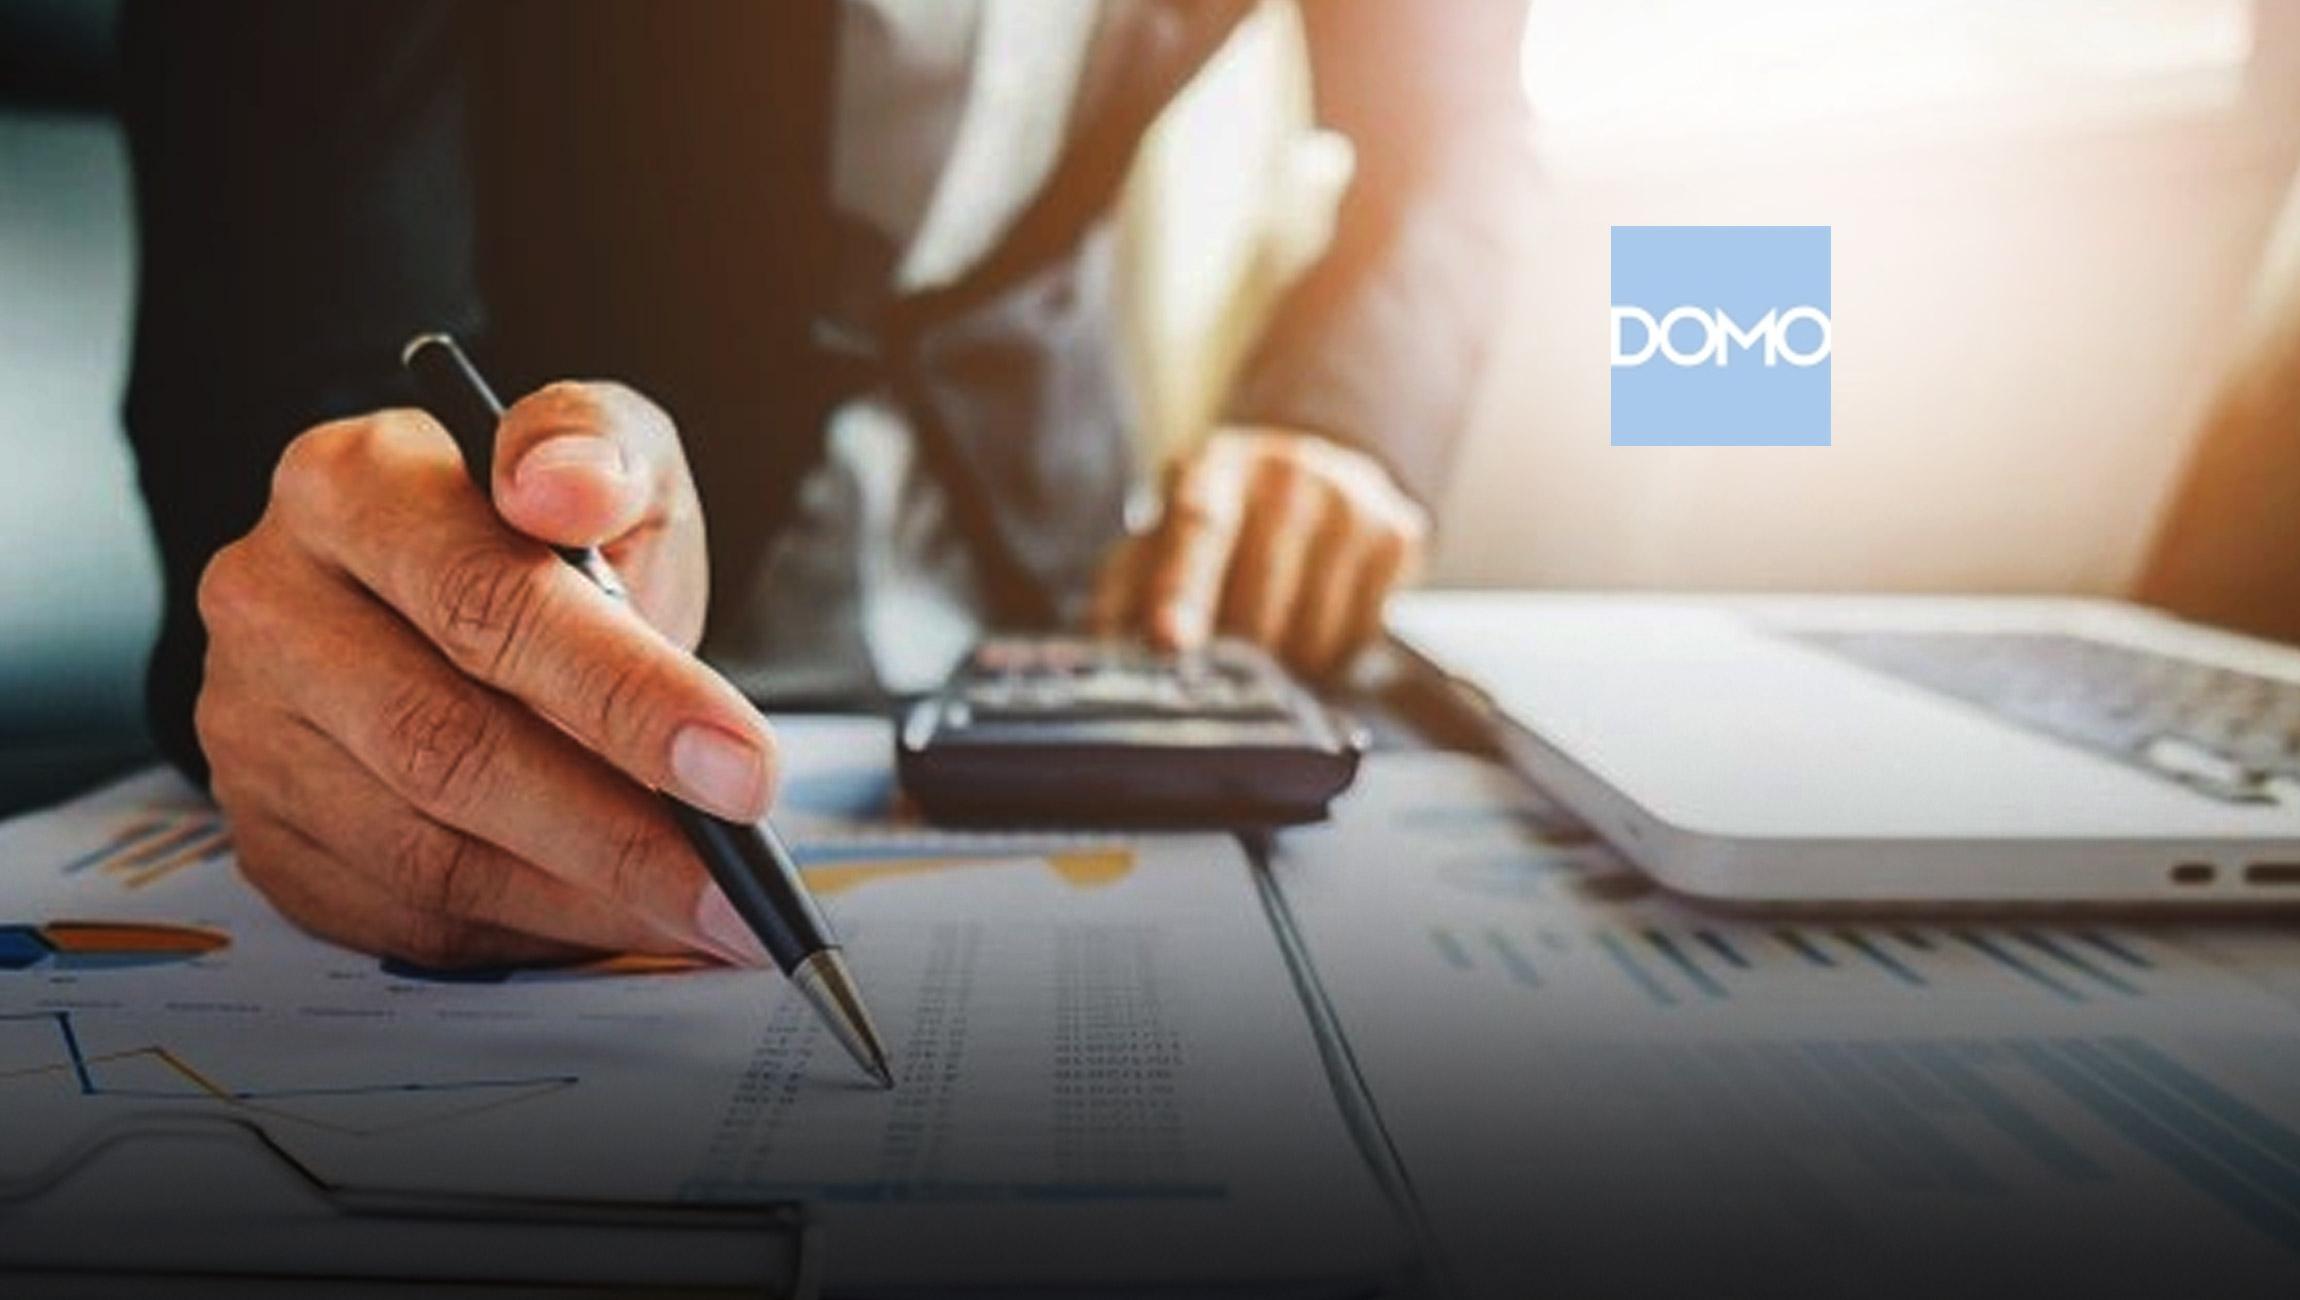 Domo Named a Challenger in 2021 Gartner Magic Quadrant for Analytics and BI Platforms